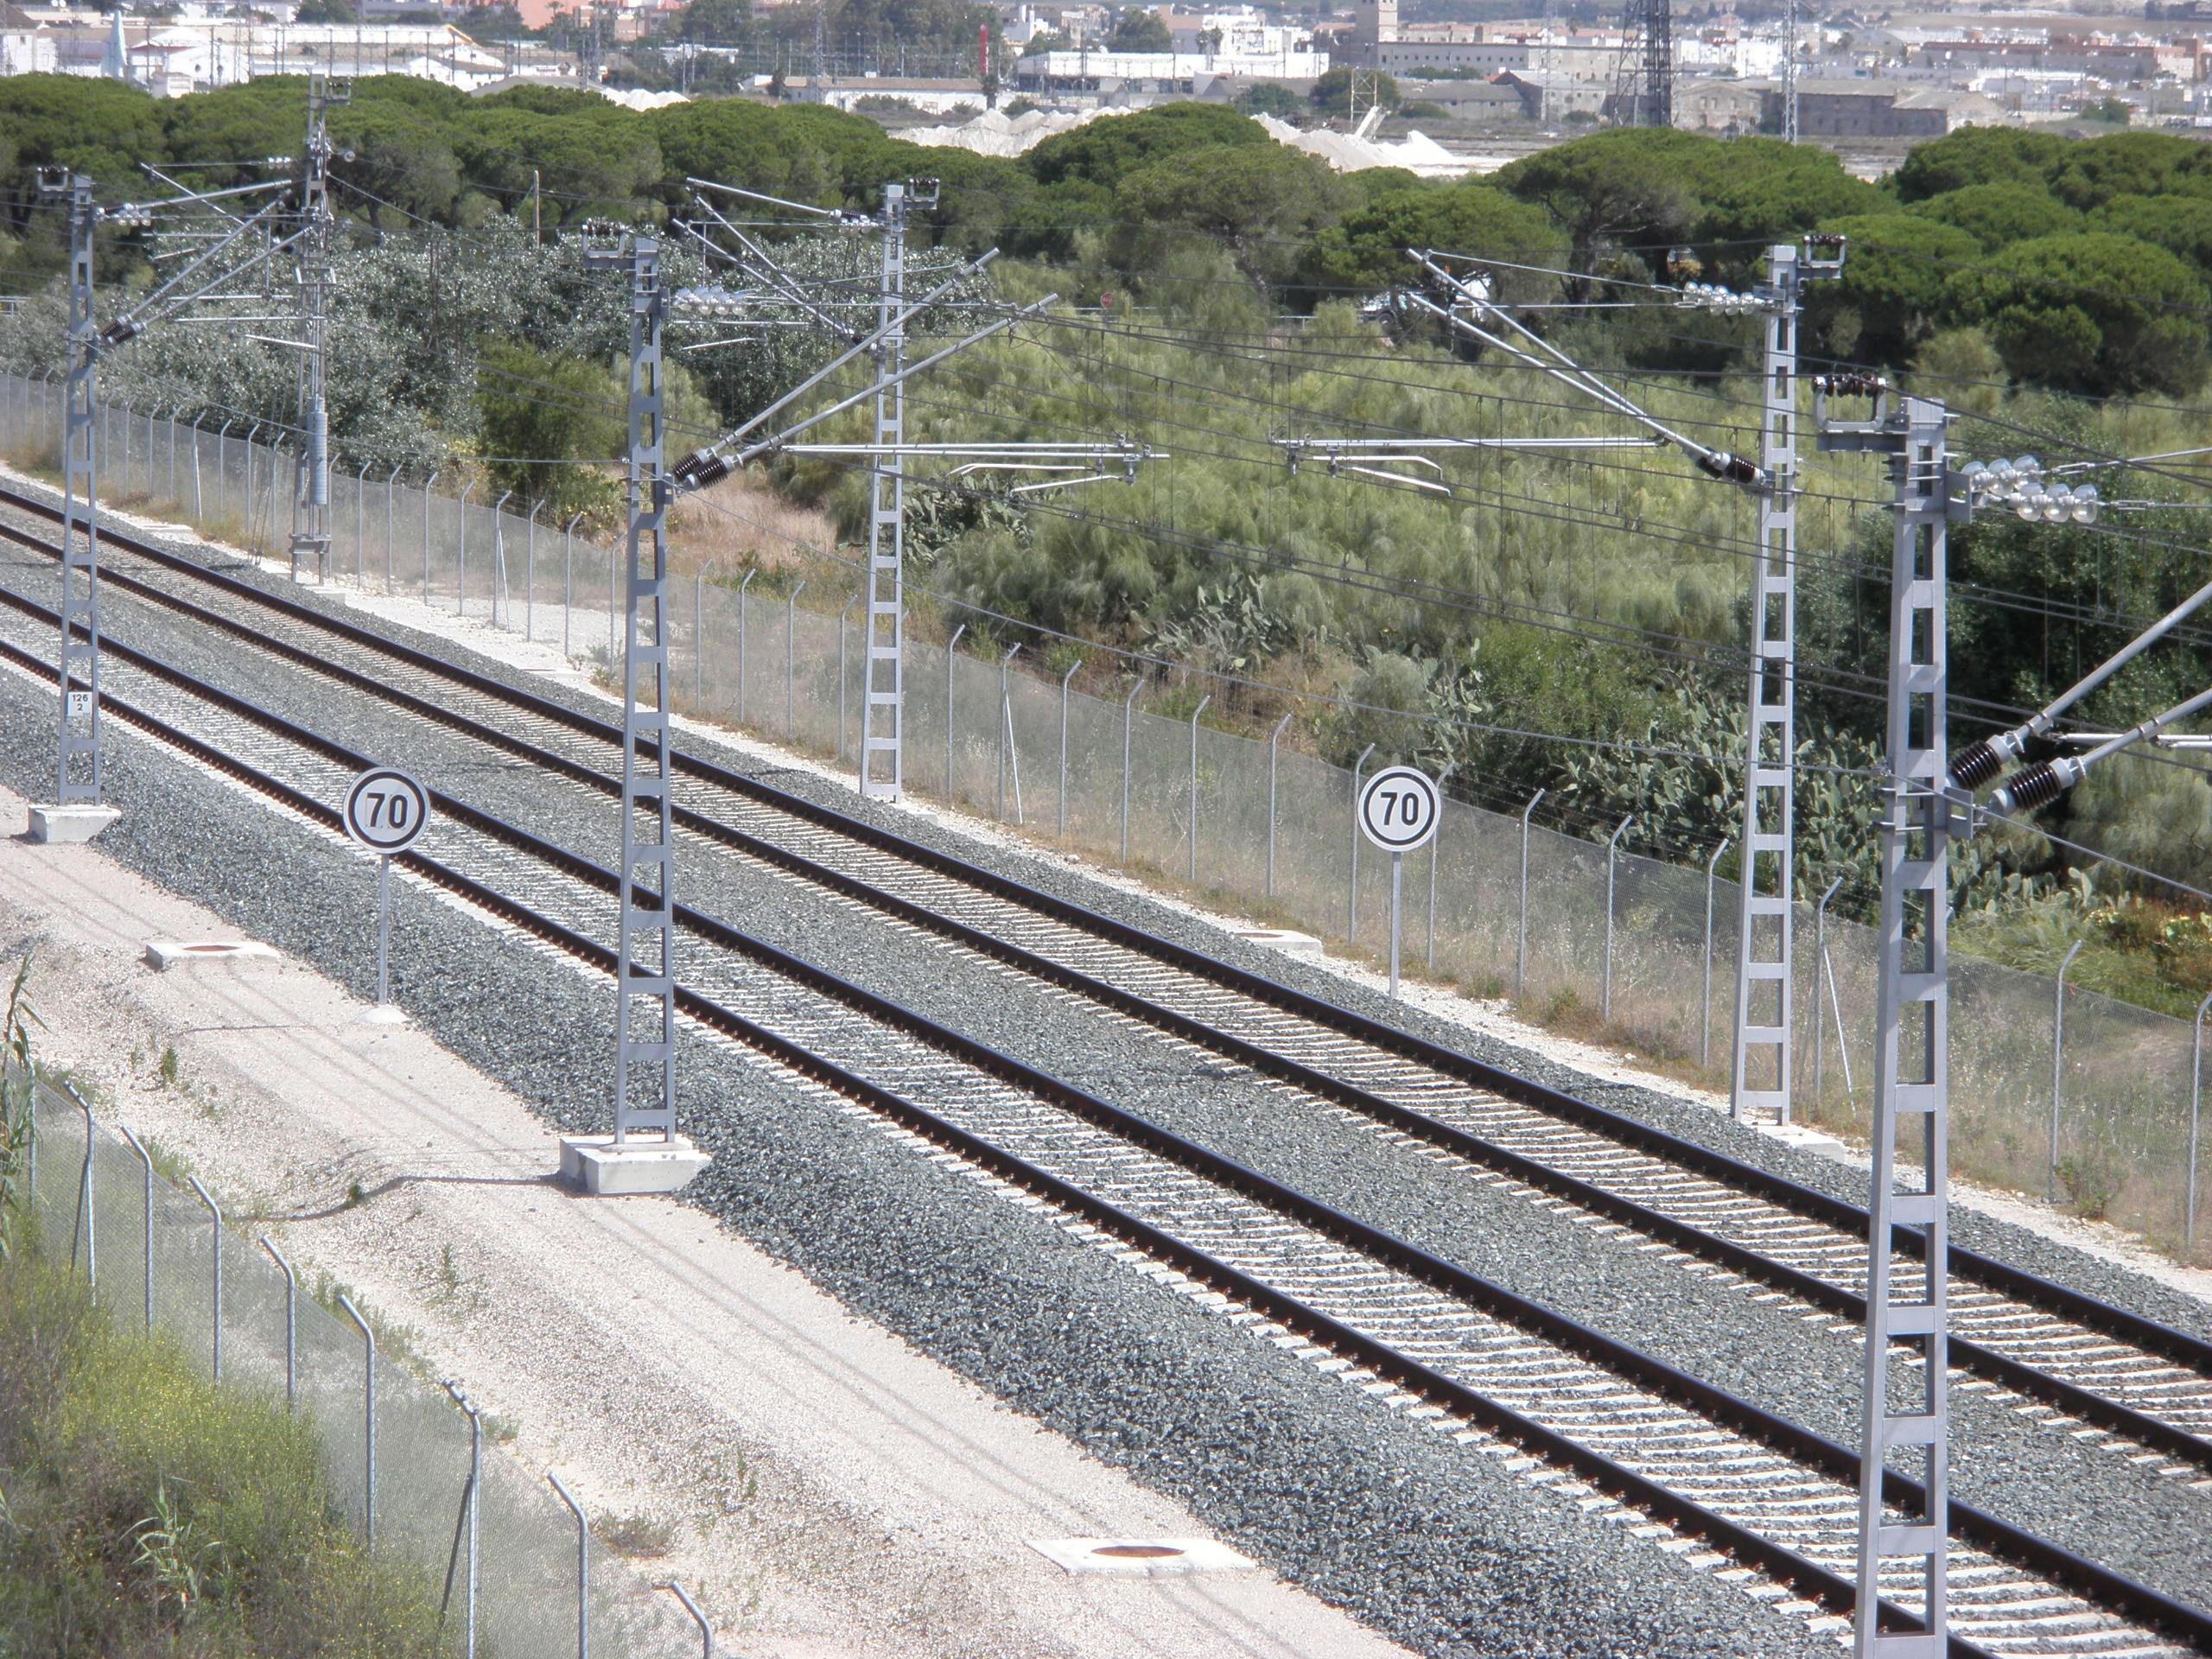 Archivo v as cerca de la estaci n de trenes de valdelagrana el puerto de santa mar a c diz - Tren el puerto de santa maria madrid ...